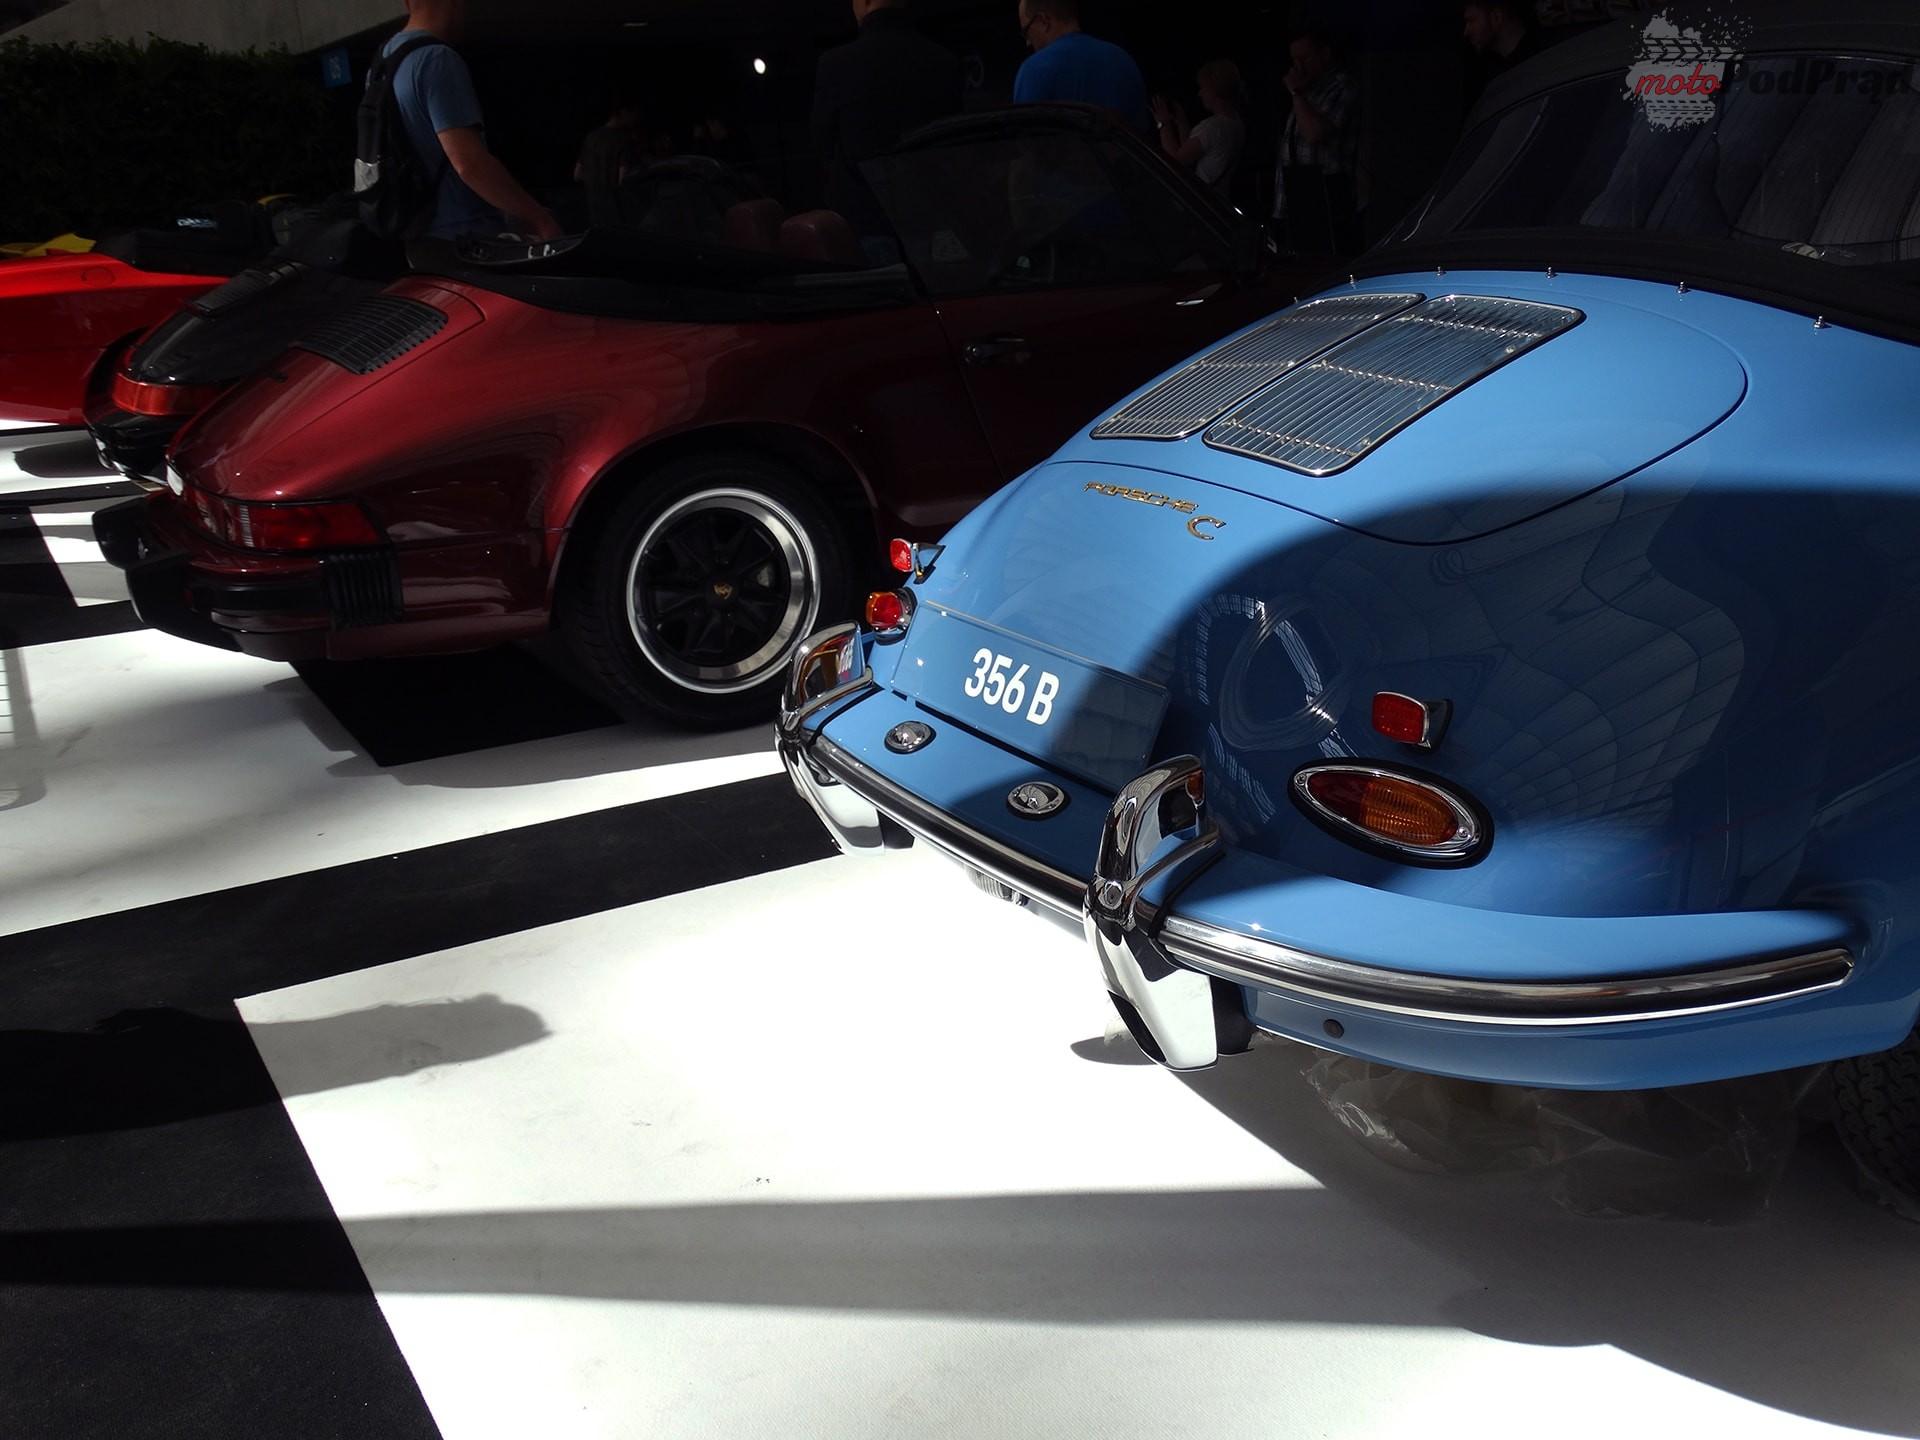 auto nostalgia 10 Auto Nostalgia 2018   krótka relacja z targów